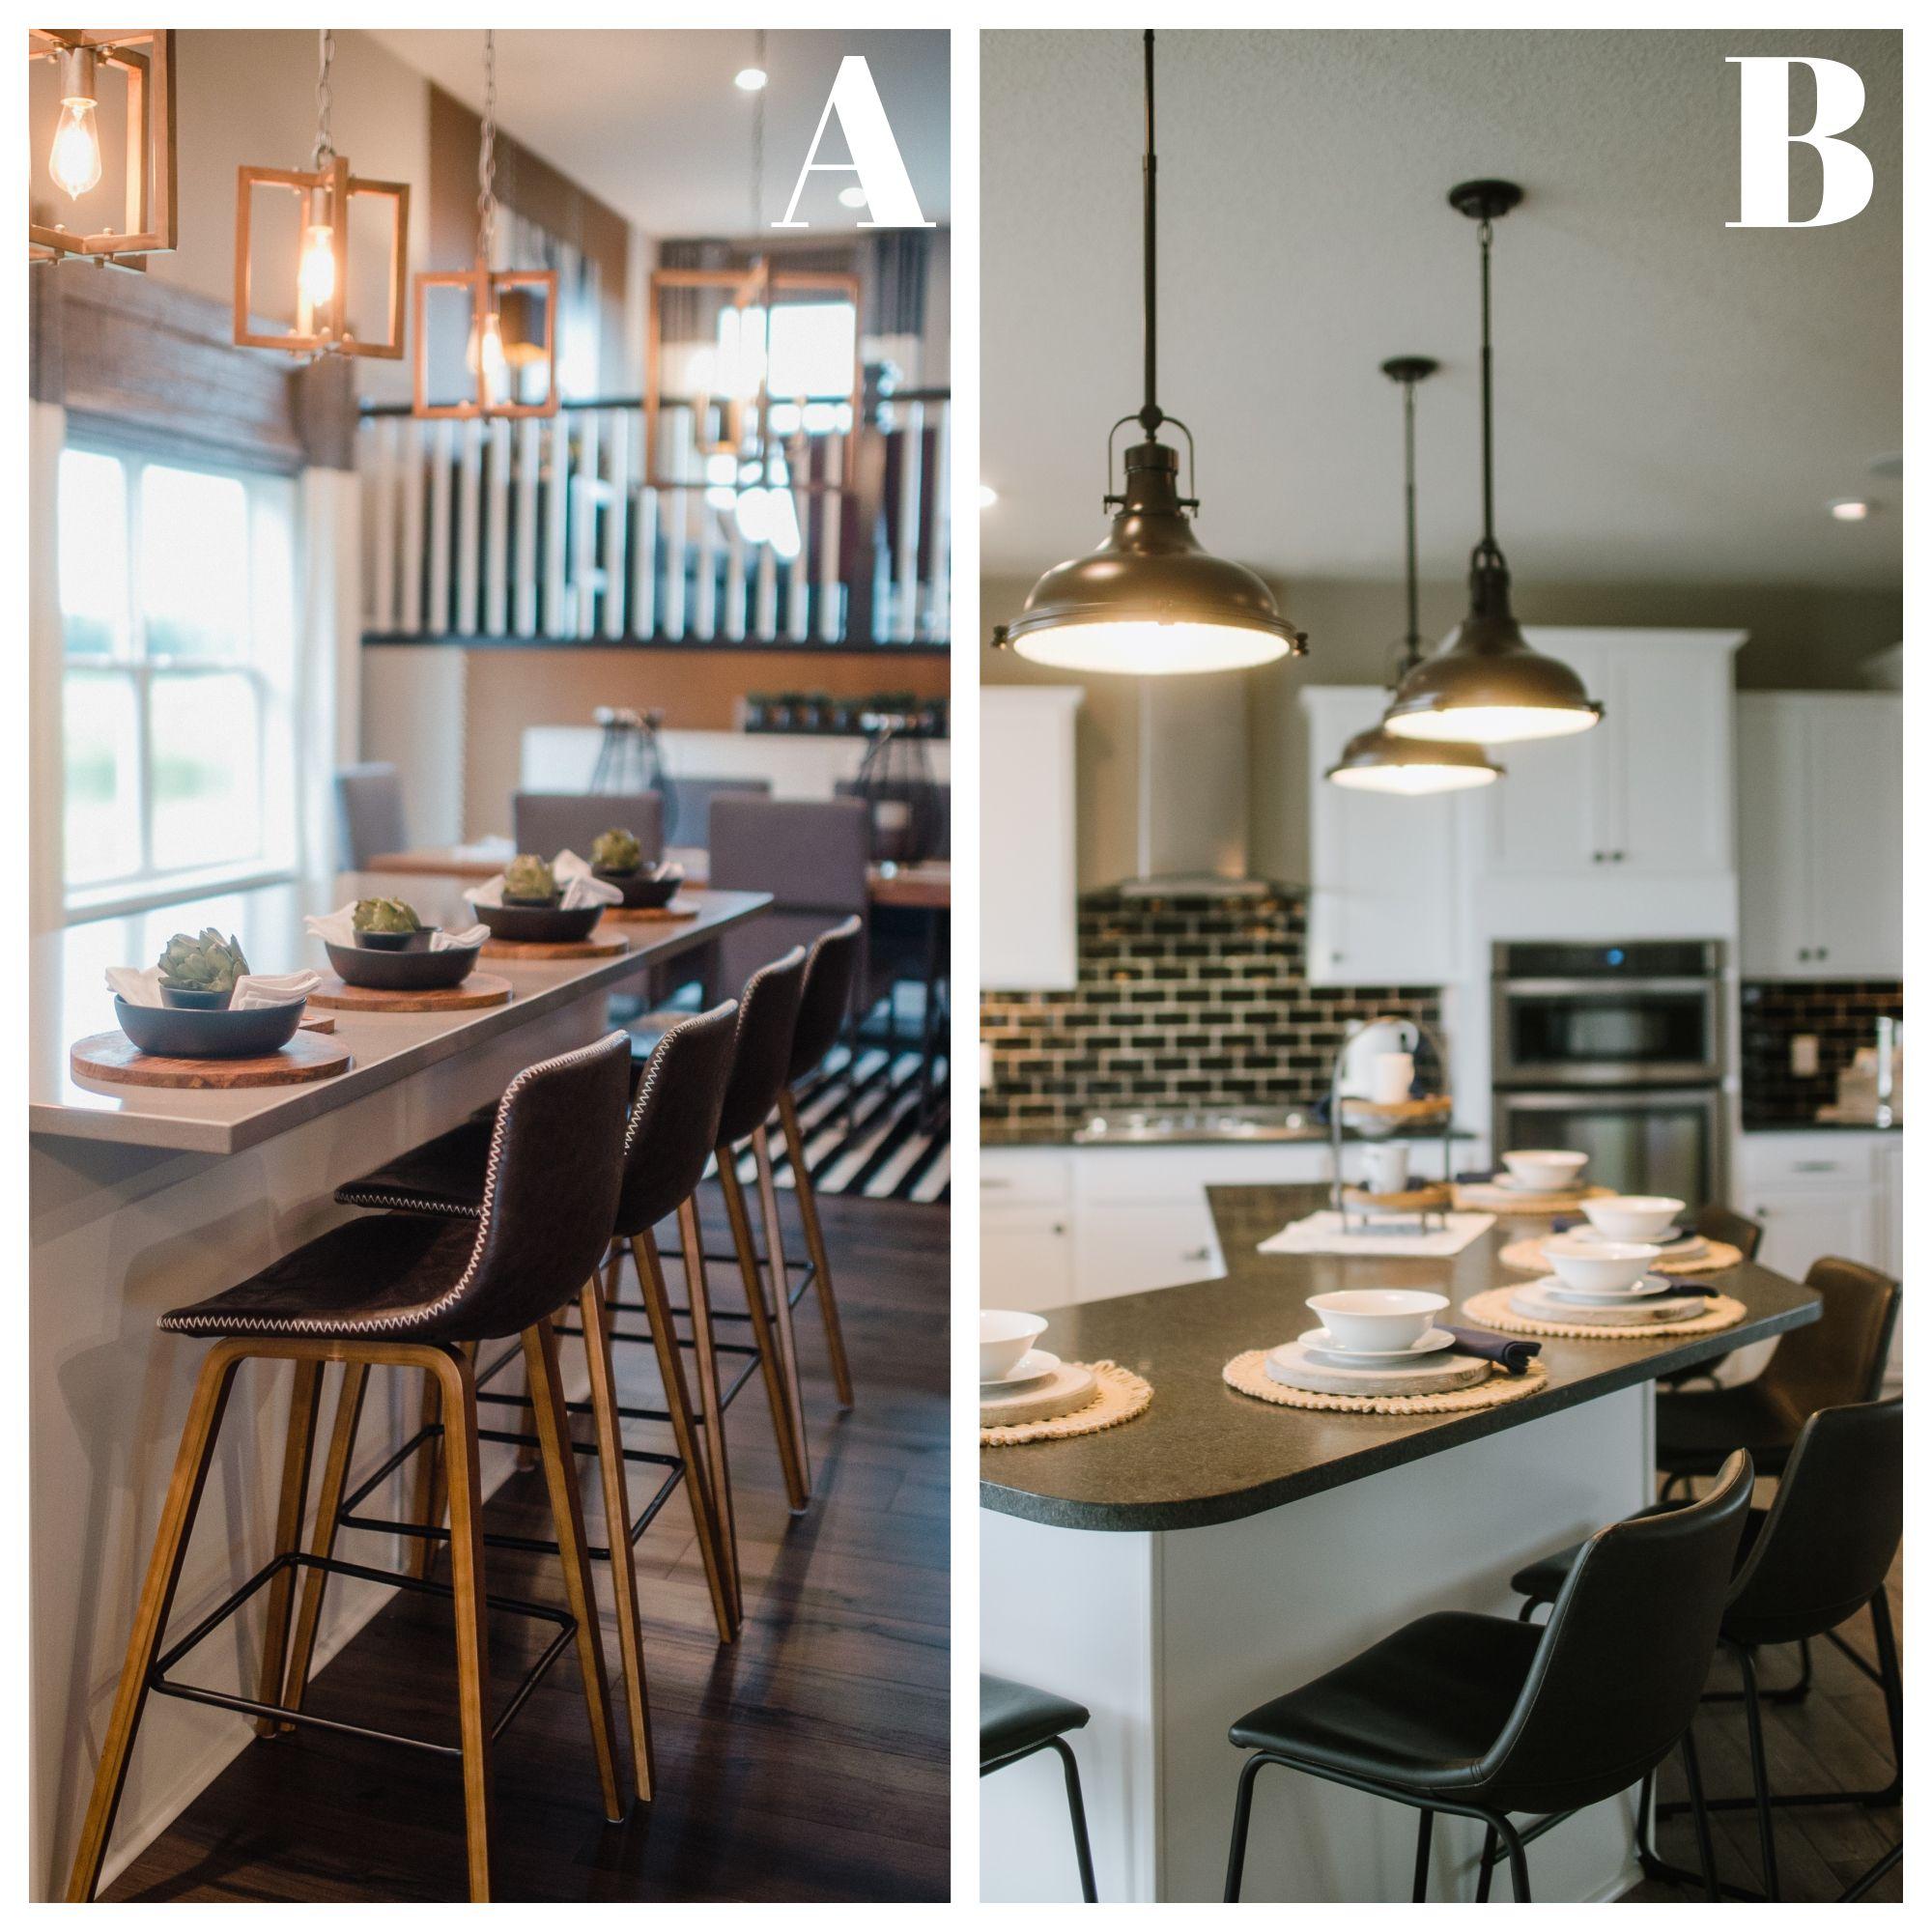 Kitchen options!! Minnesota home, New home construction